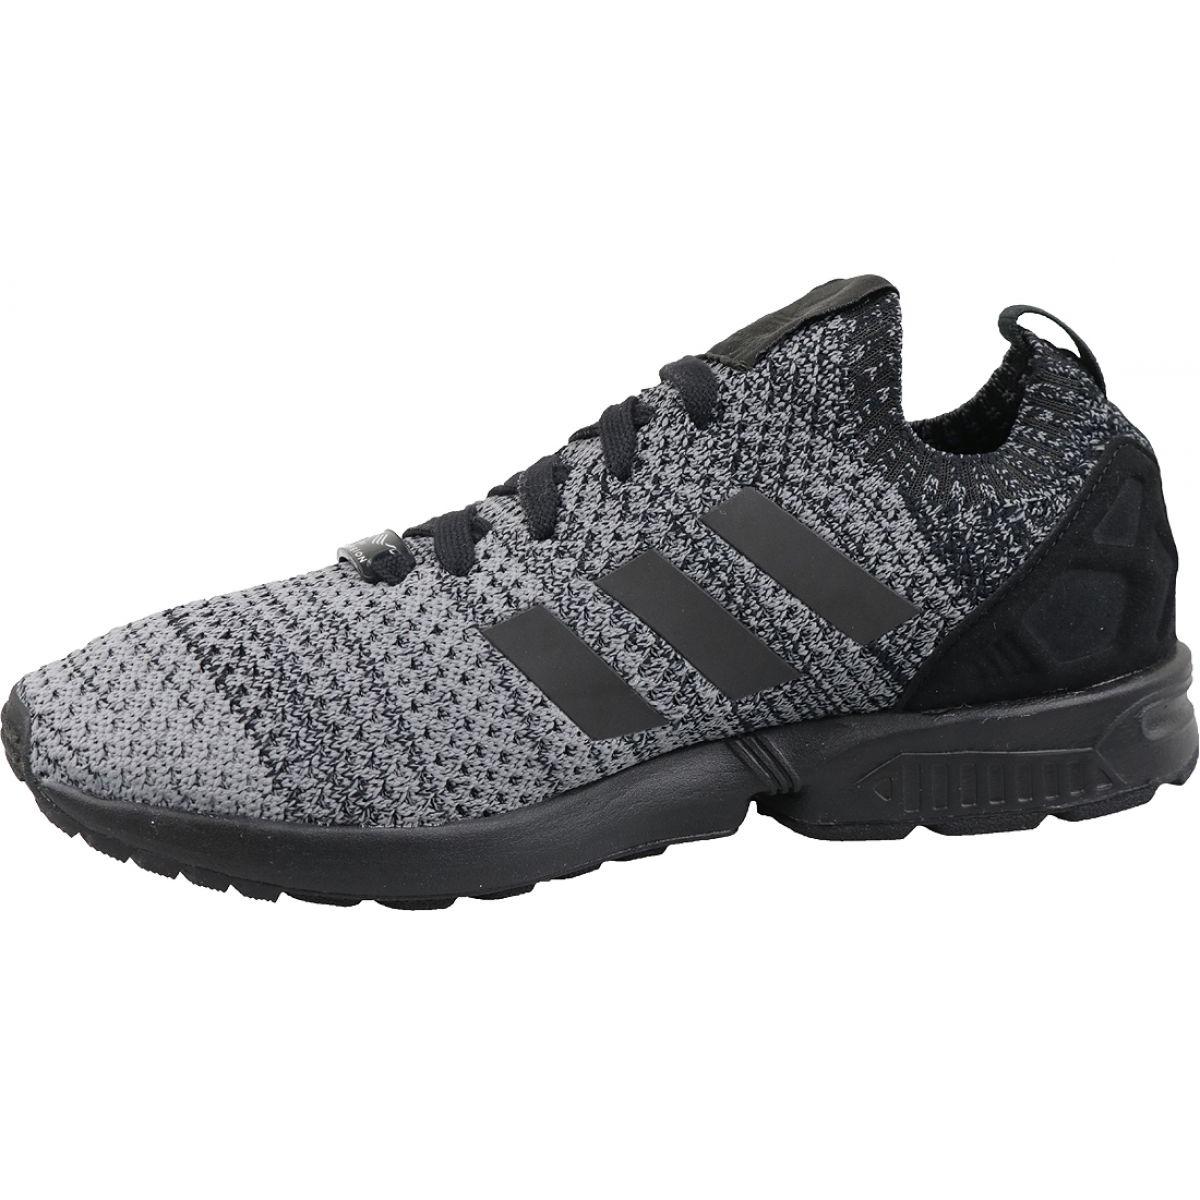 televisor capturar noche  Adidas Originals Zx Flux Primeknit M BZ0562 shoes black - ButyModne.pl